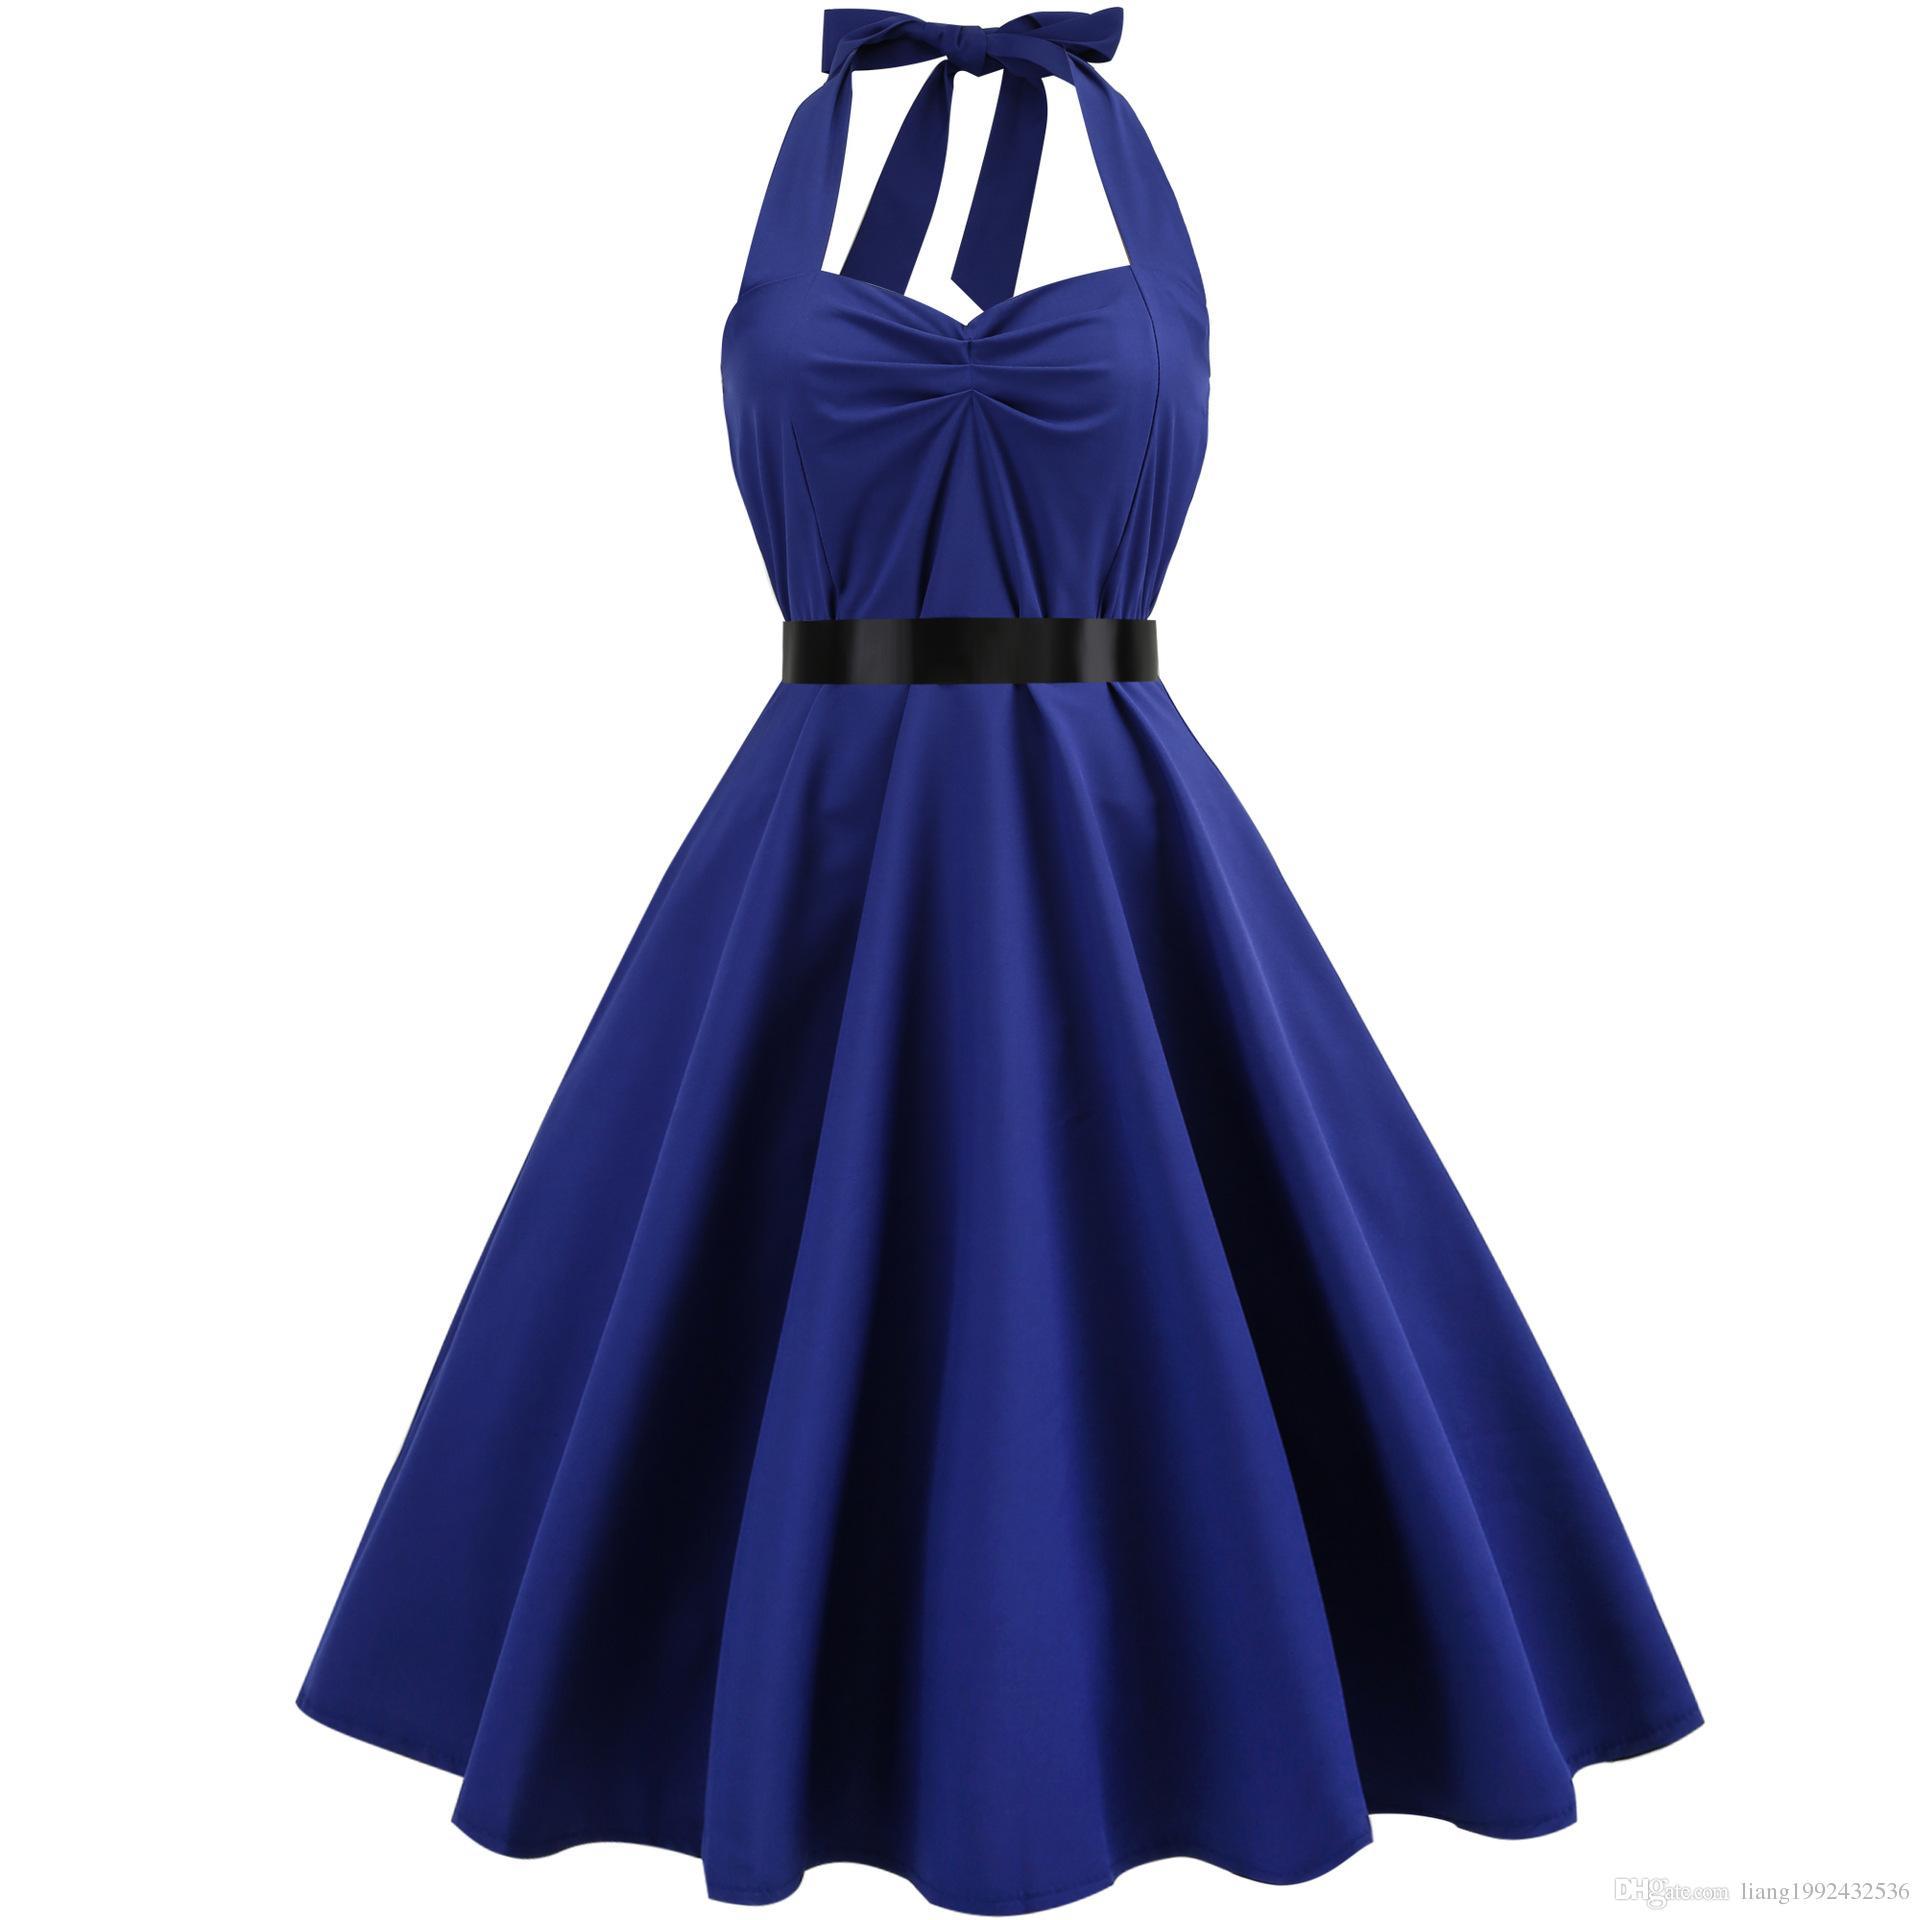 Summer Retro Vestido Flower Button Collar Halter Belt Backless Vintage Swing Casual Women Maxi Wrap Dress Evening Party